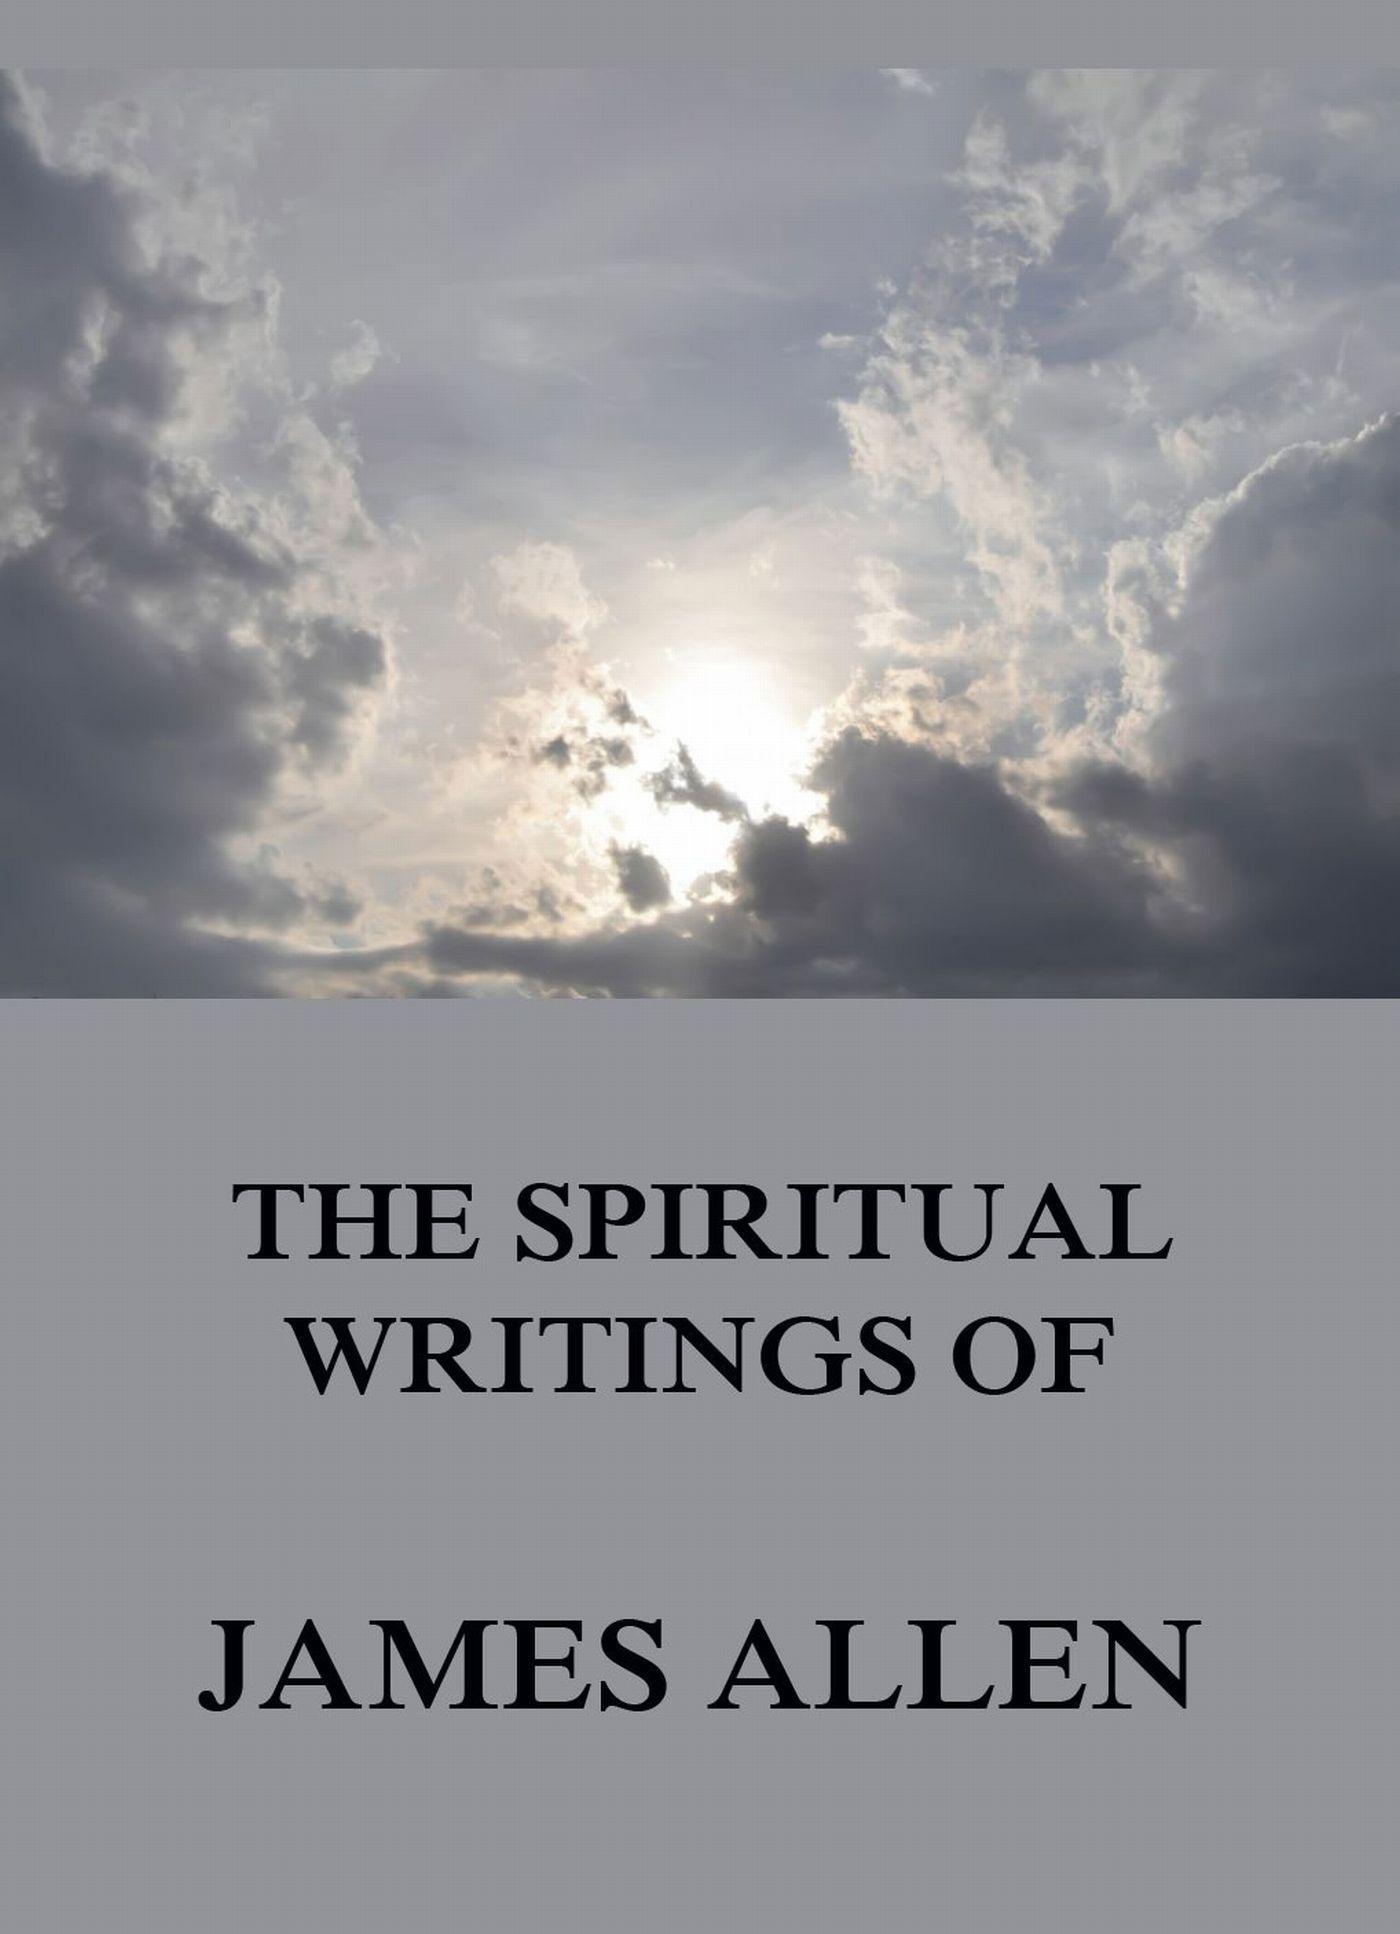 лучшая цена James Allen The Spiritual Writings Of James Allen